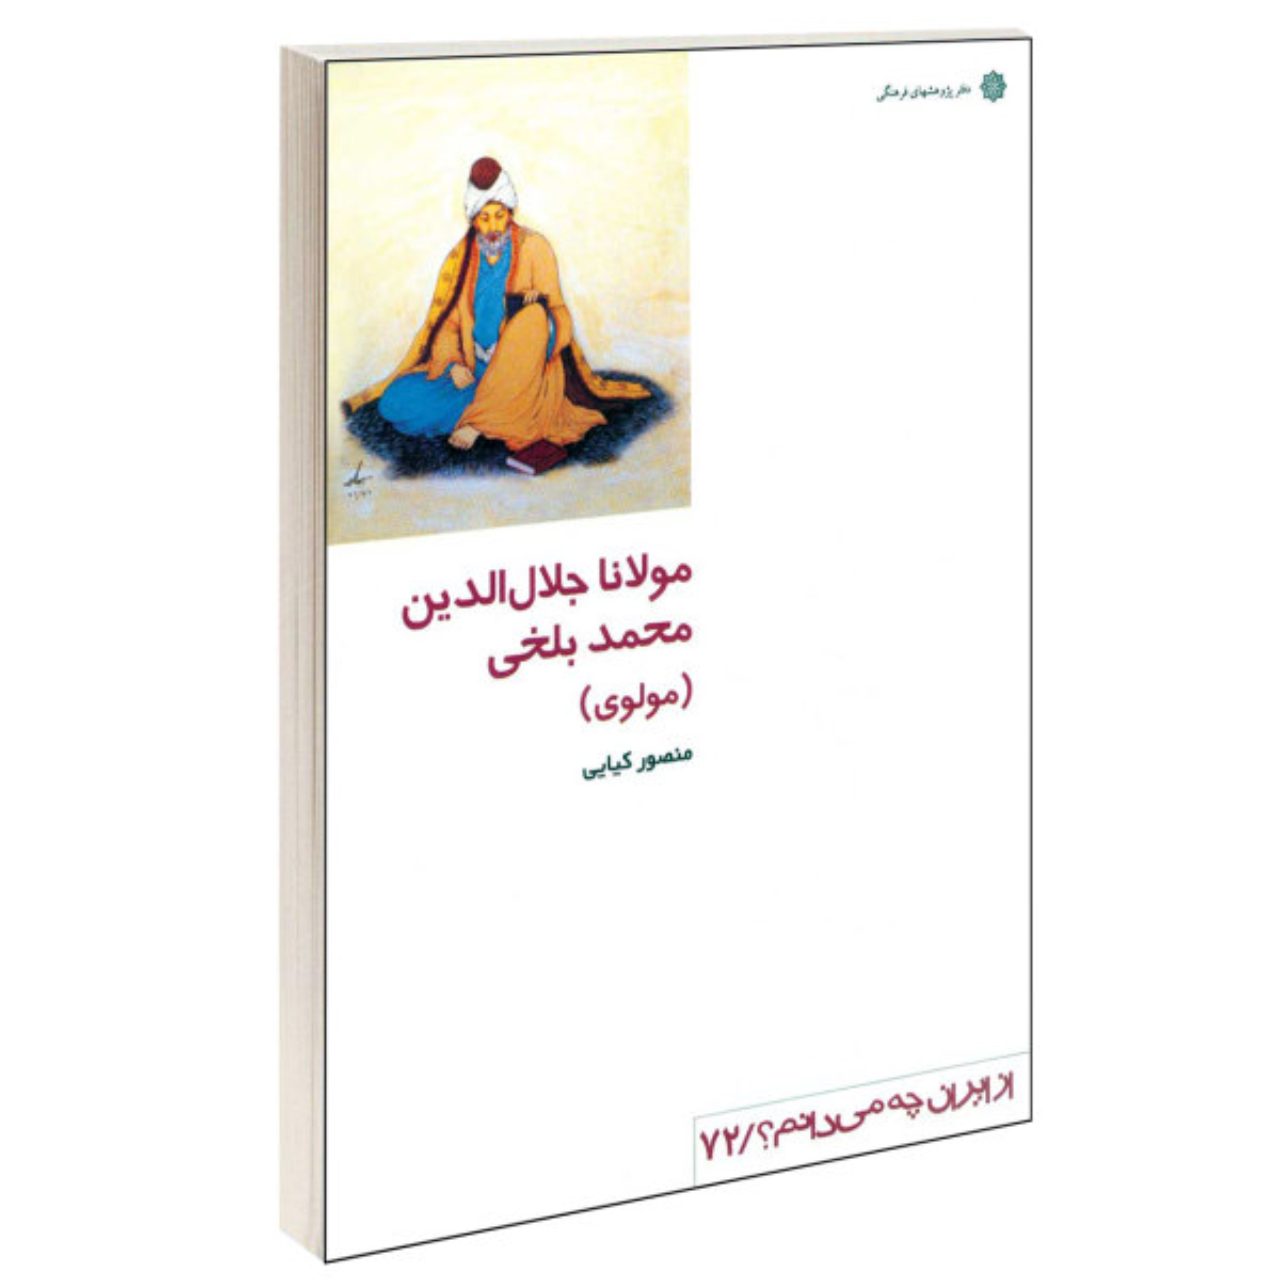 کتاب مولانا جلال الدین محمد بلخی (مولوی) اثر منصور کیایی نشر دفتر پژوهش های فرهنگی